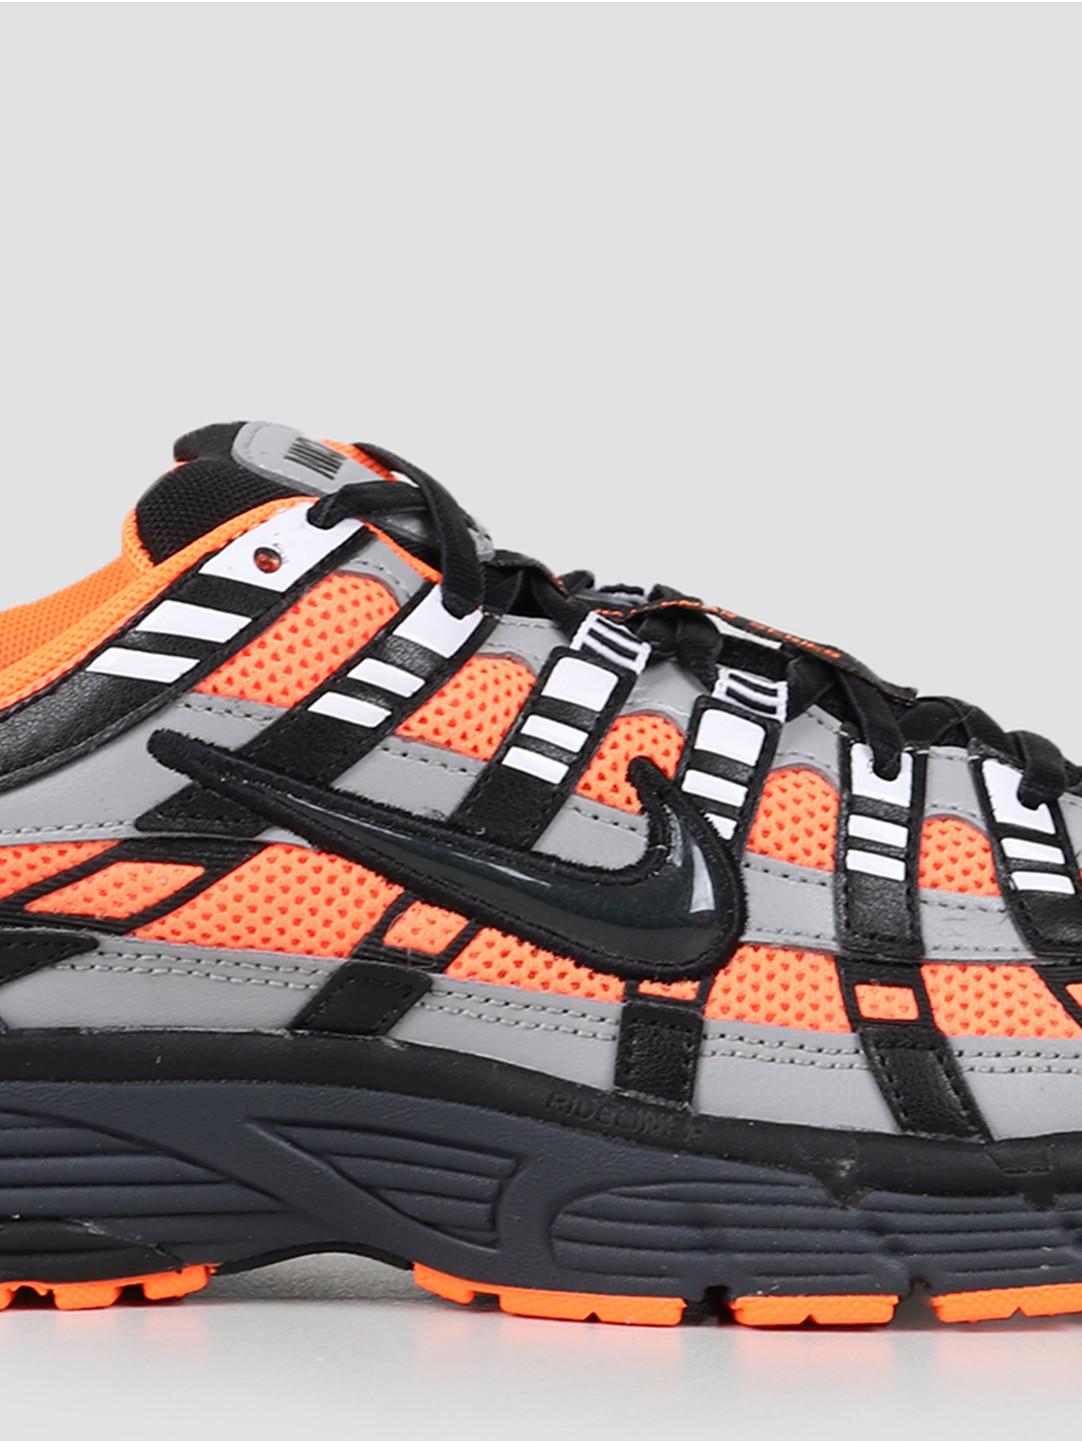 Nike Nike P 6000 Total Orange Black Anthracite Flt Silver CD6404-800